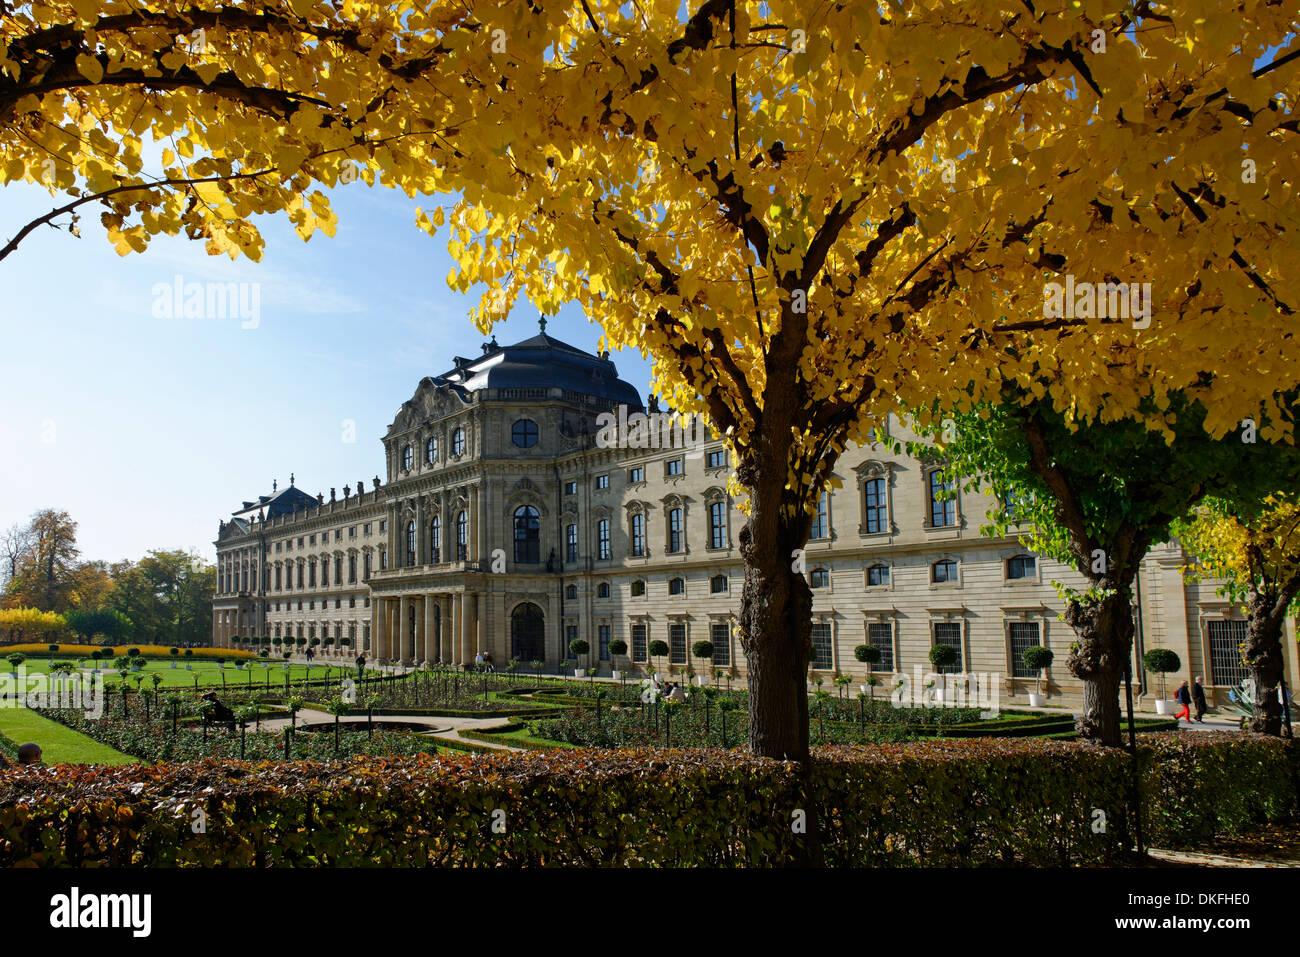 Garden view, palace gardens, Würzburg Residence, UNESCO World Heritage Site, Wuerzburg, Lower Franconia, Bavaria, Germany - Stock Image